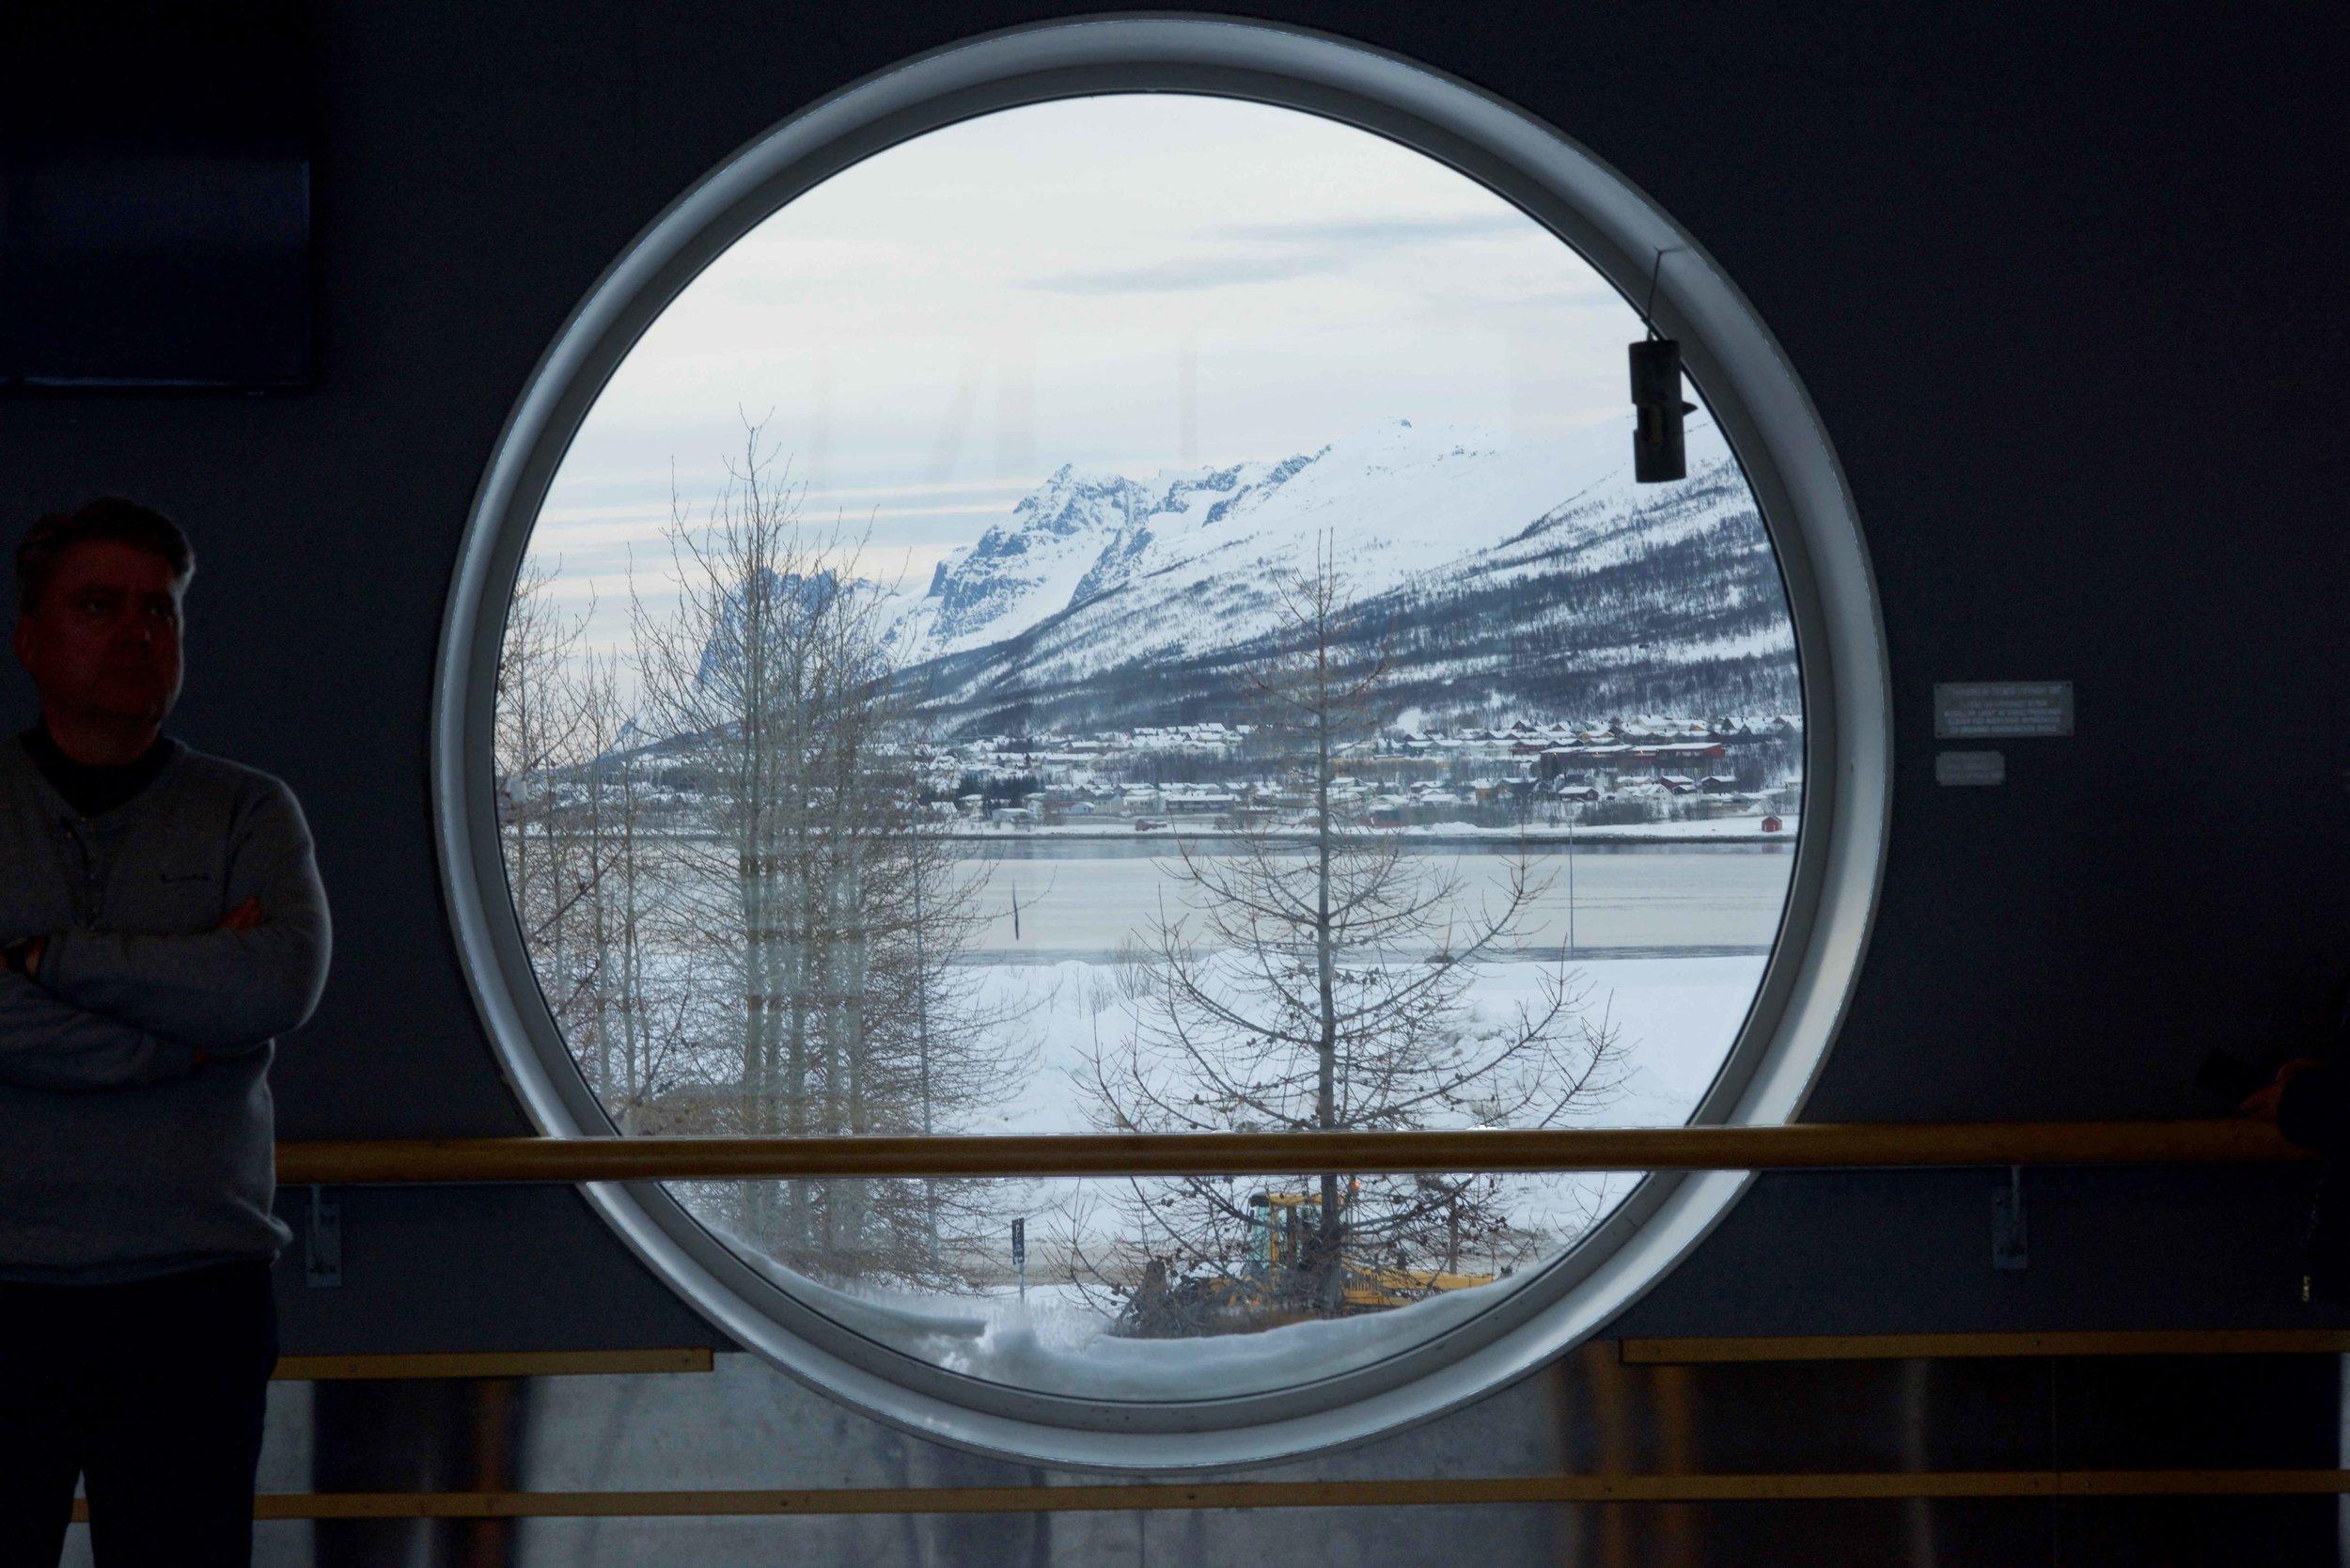 Tromso Airport, Langnes, Tromso, Norway. Image©thingstodot.com